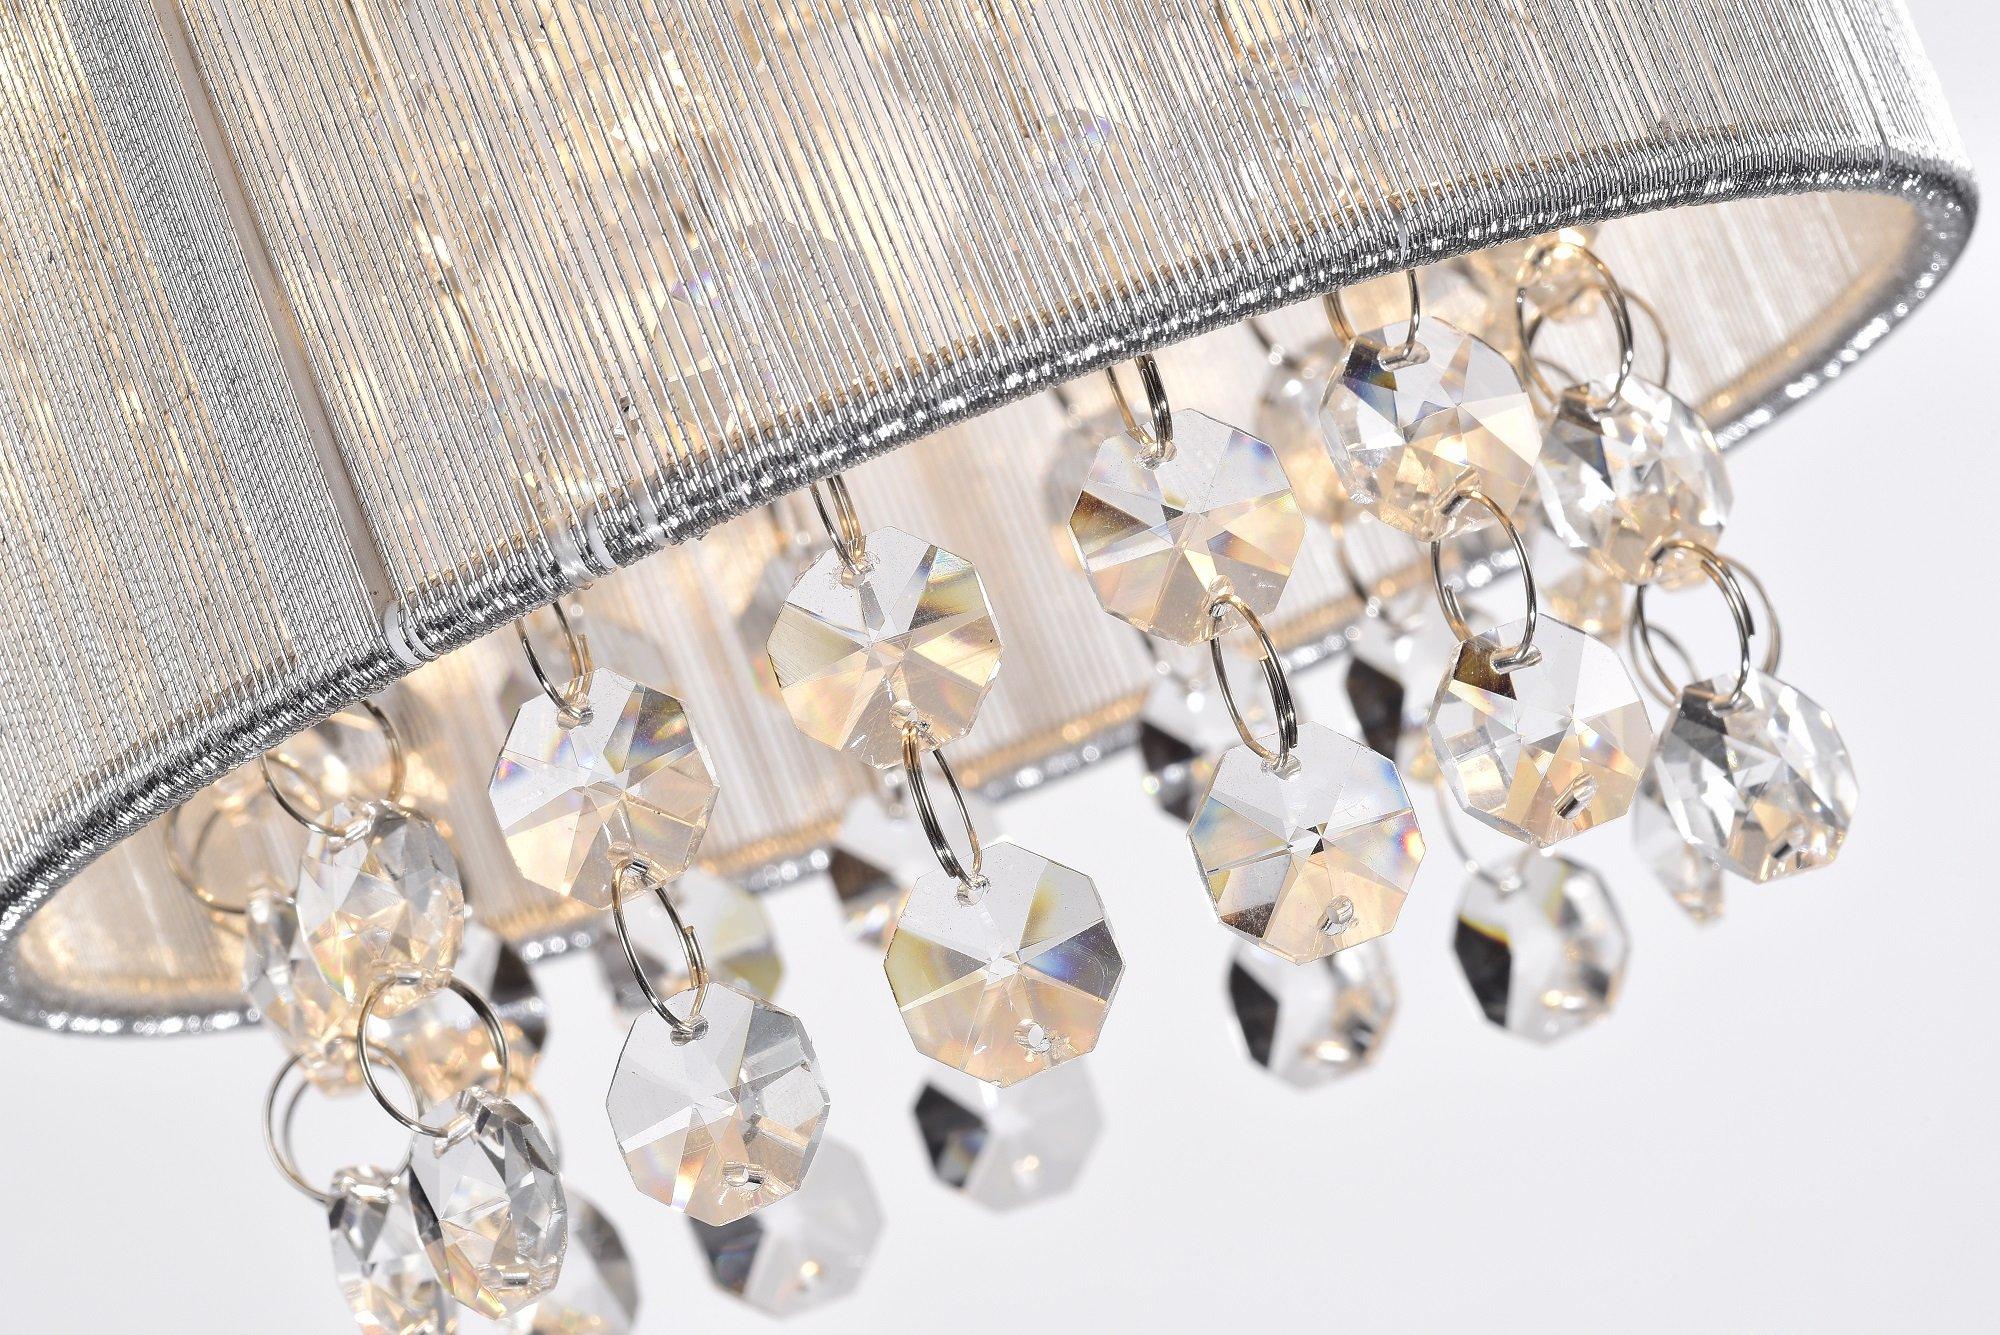 LaLuLa Pendant Lighting Mini Pendant Light Silver Drum Crystal Chandelier 1 Light by LaLuLa (Image #8)